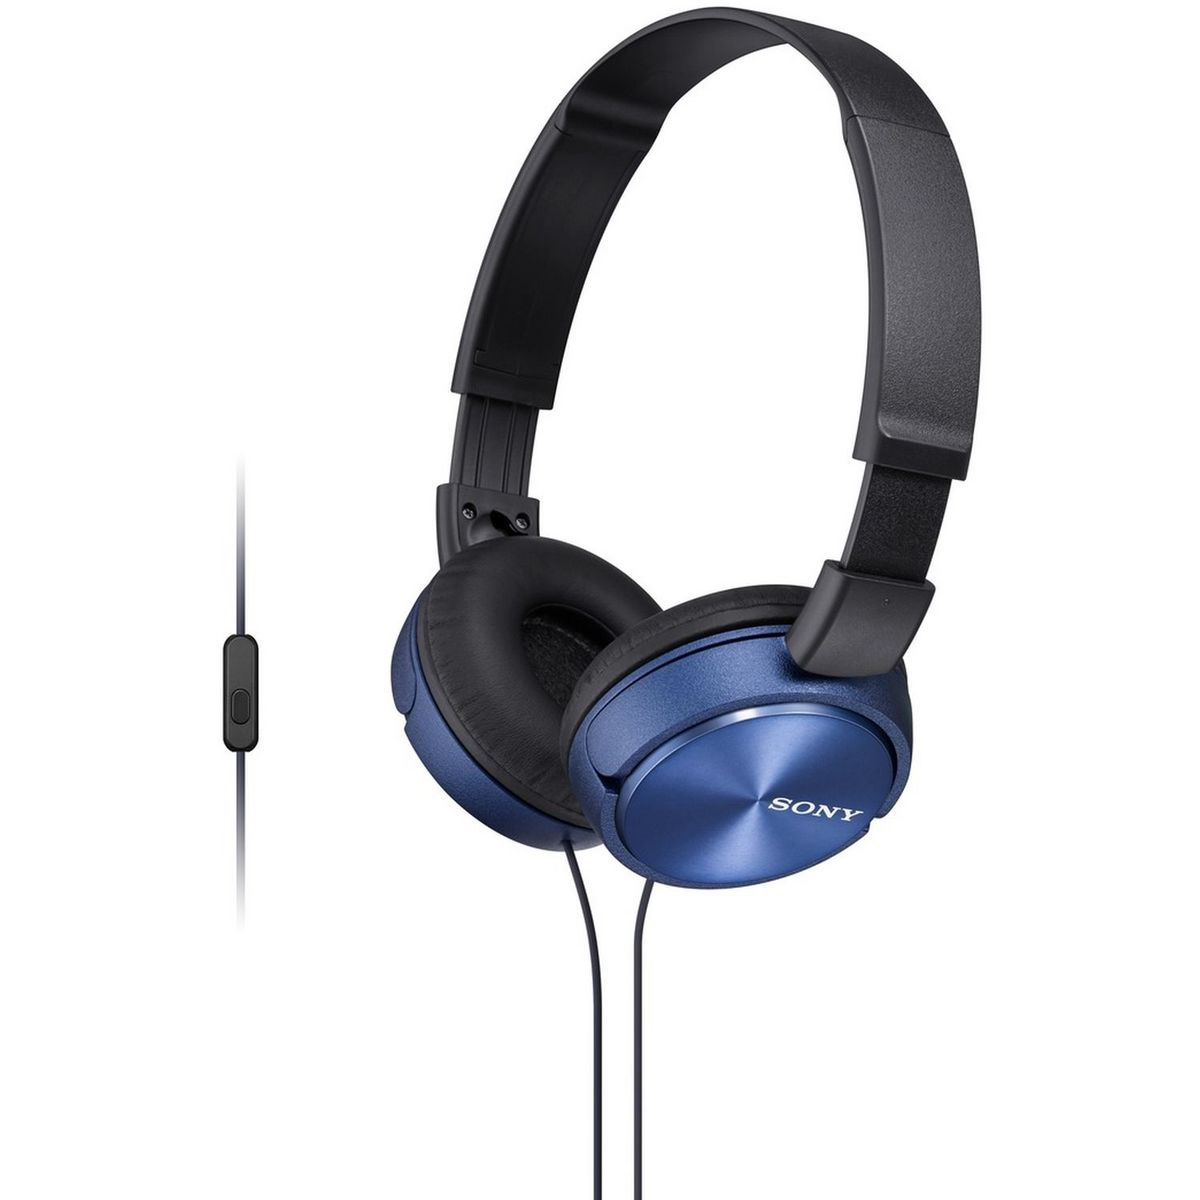 Casque audio filaire - Bleu - MDR ZX310 APB